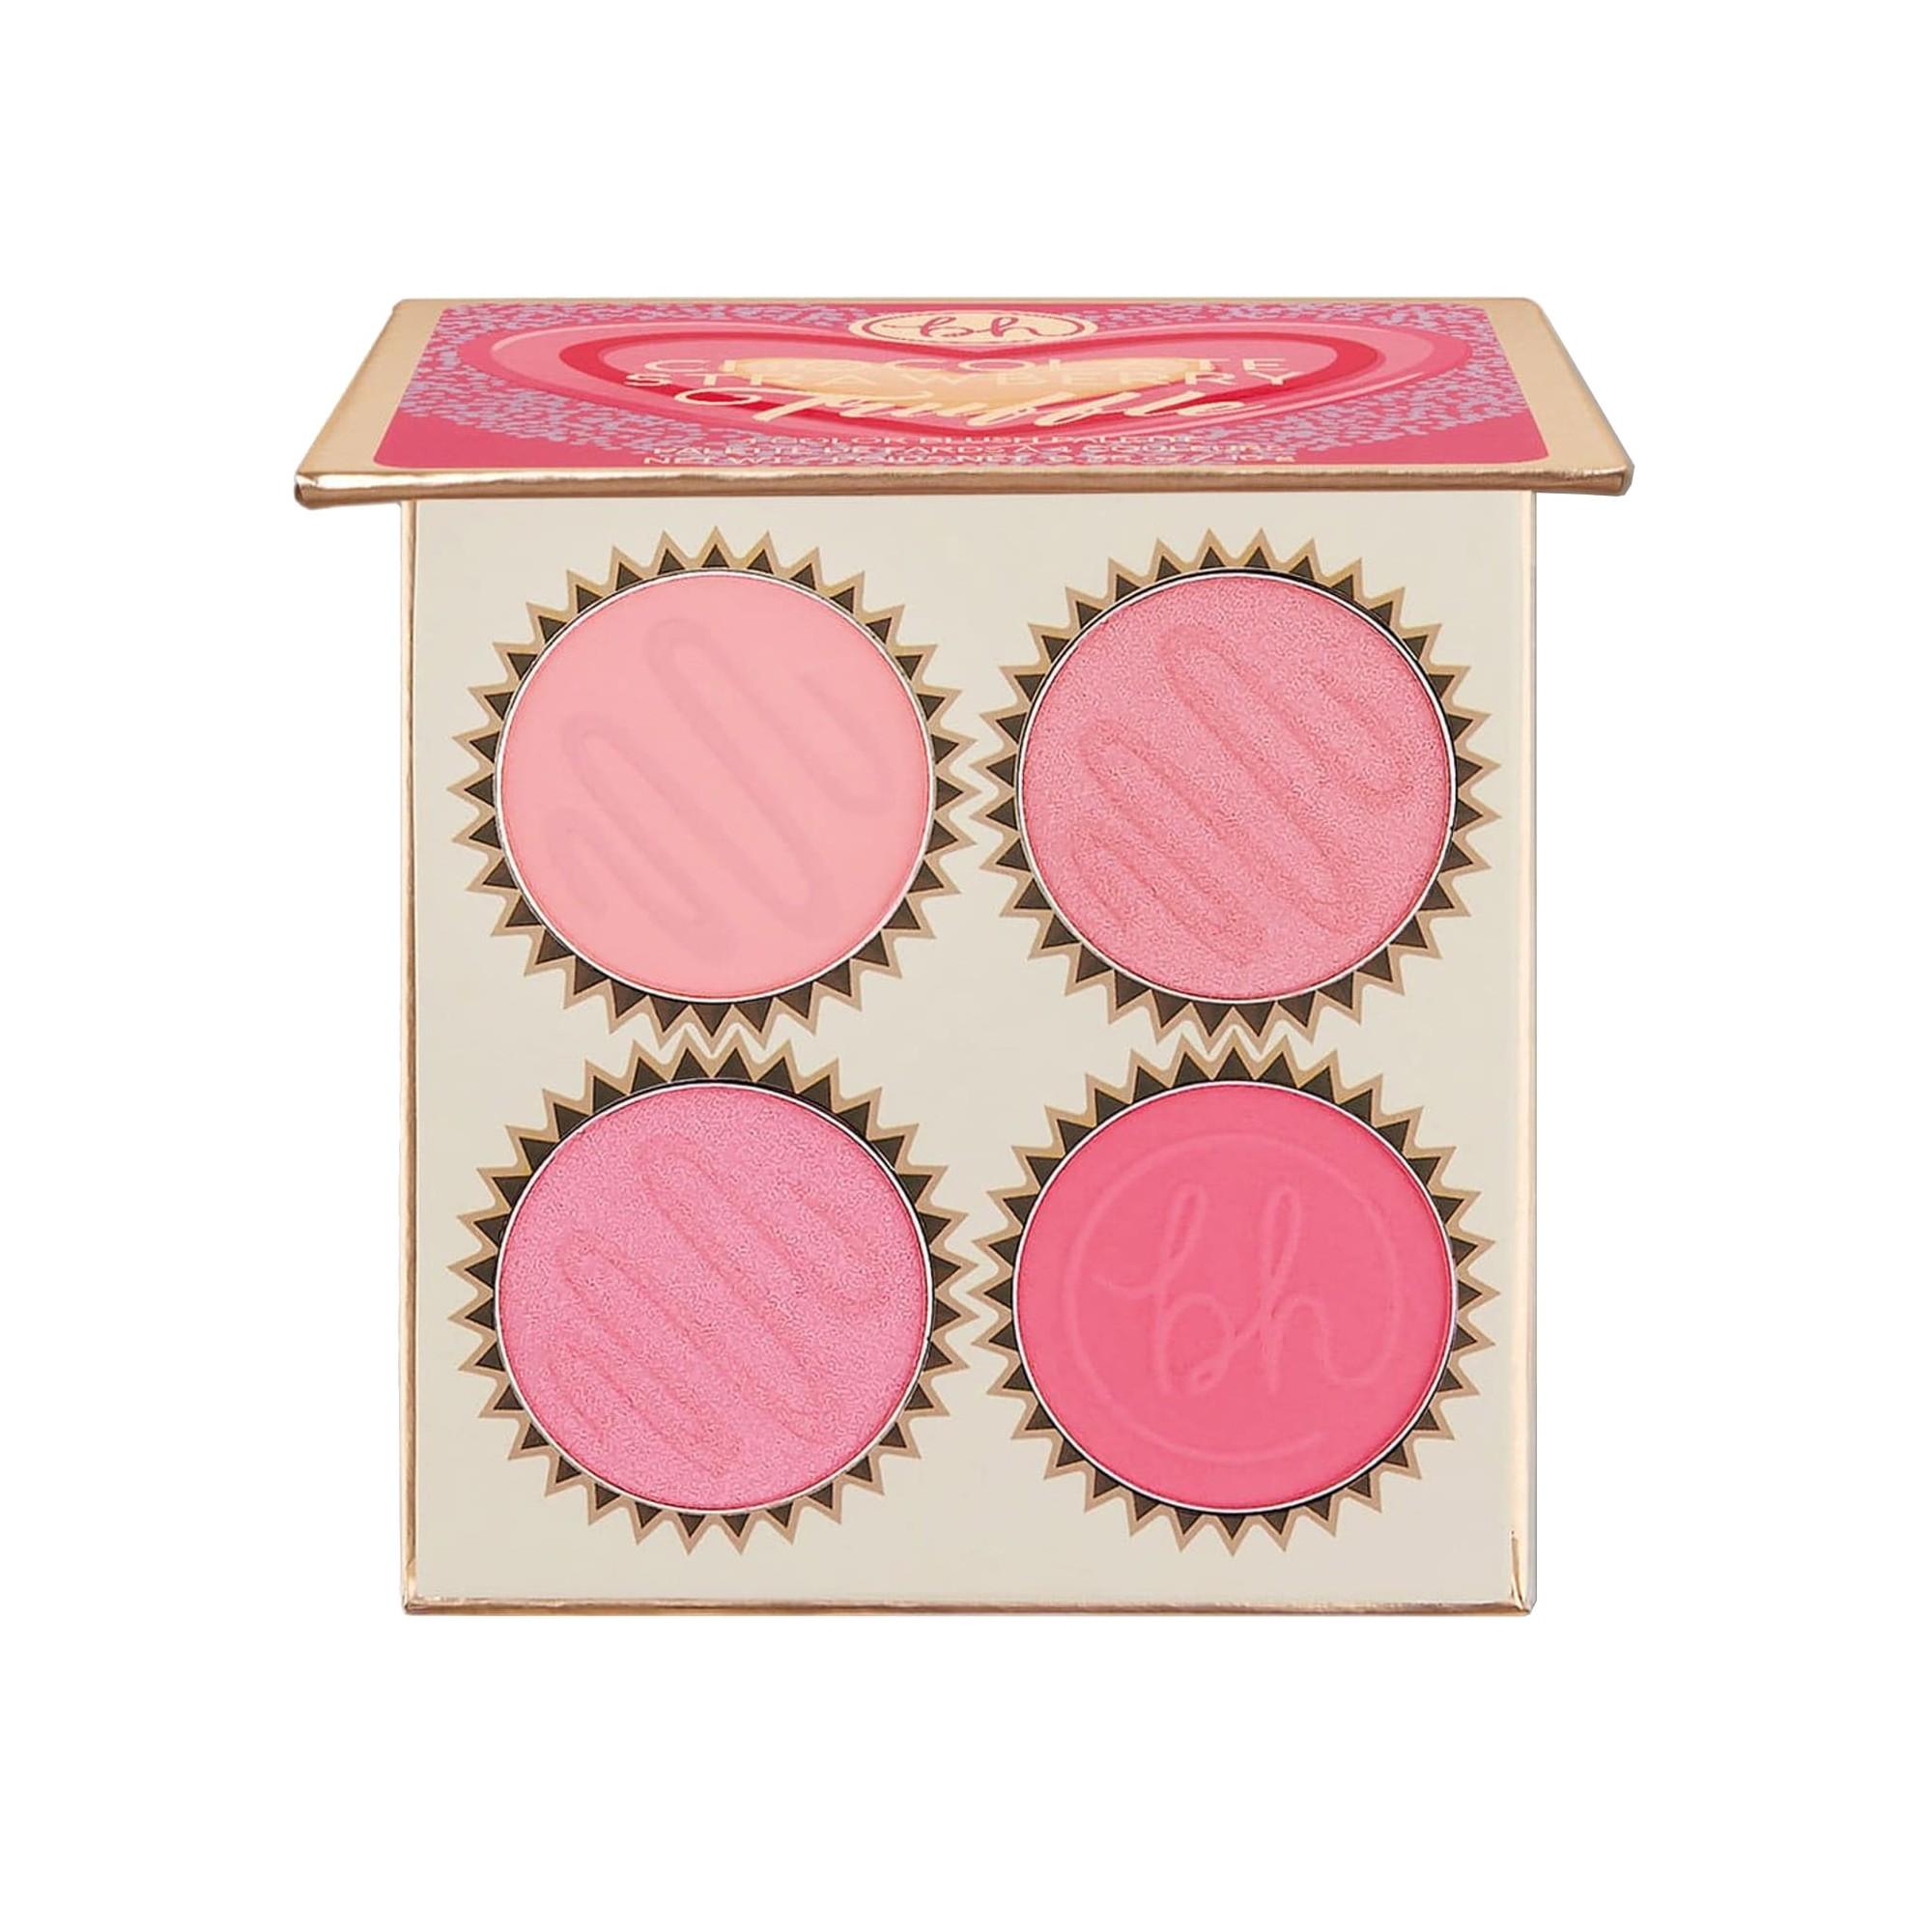 BH Cosmetics Truffle Blush 4 Color Blush Palette Chocolate Strawberry